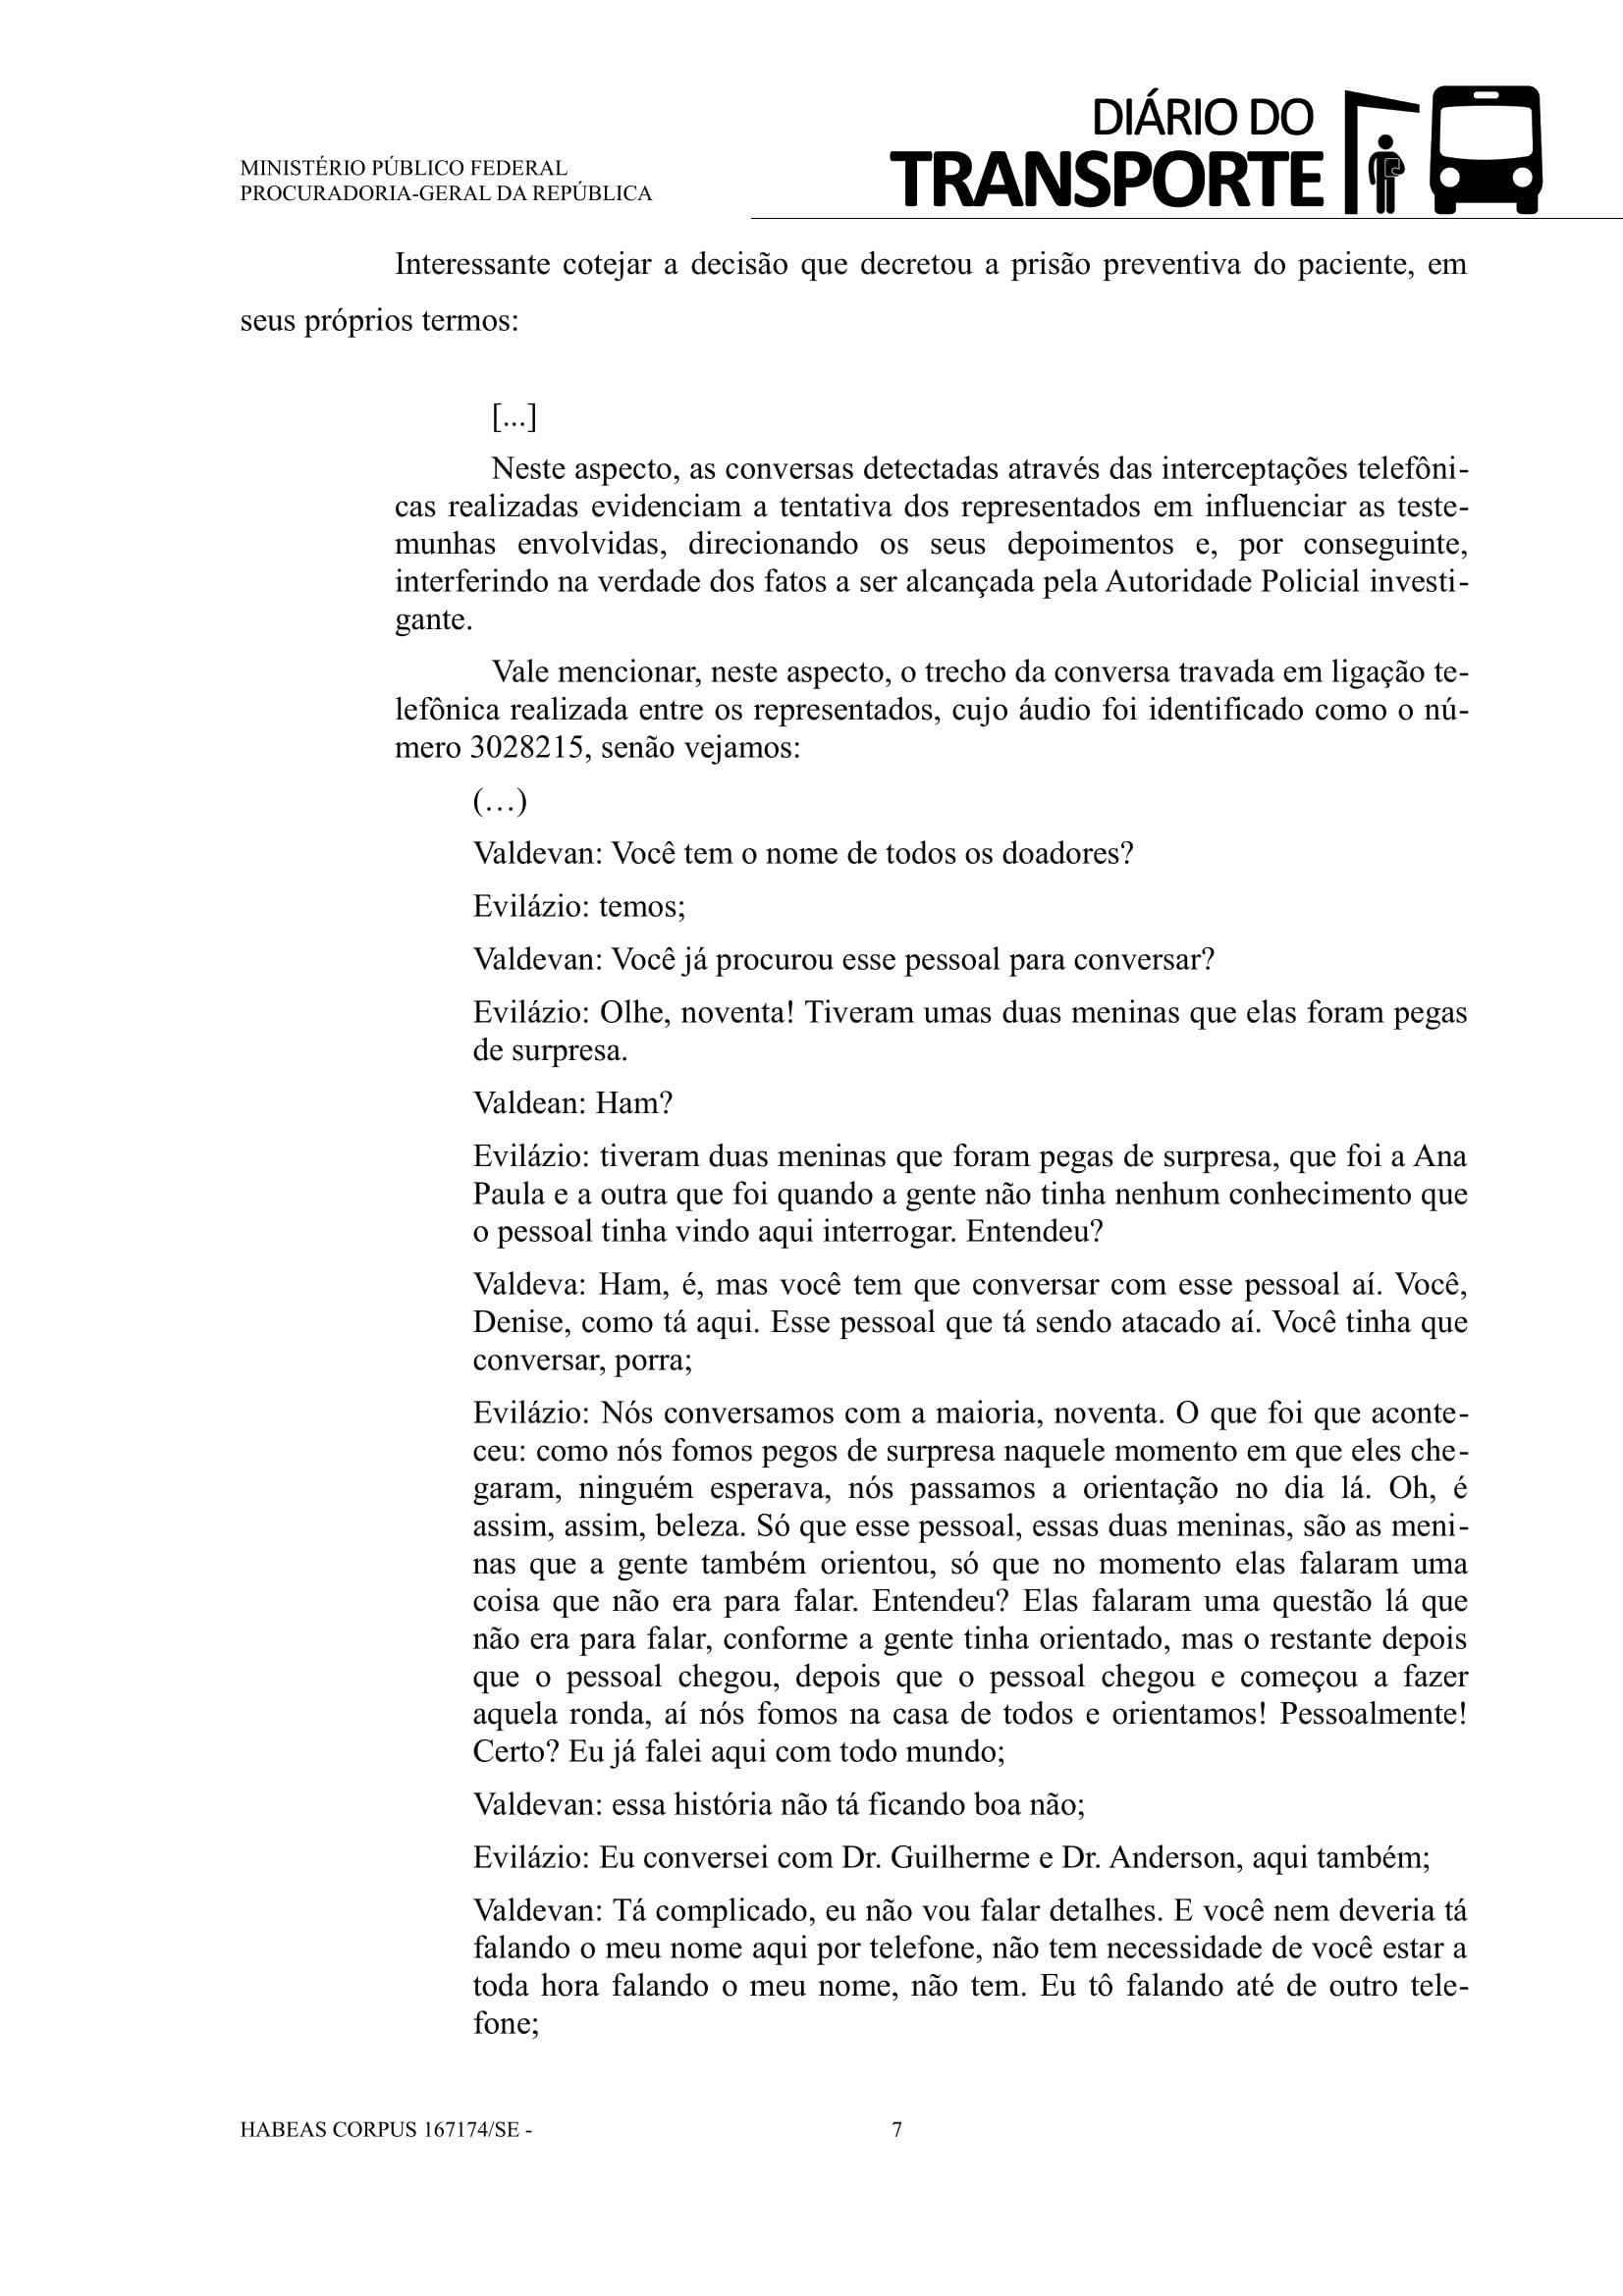 HC 167174_ContrarrazoesAgravo_Jose Valdevan de Jesus Santos-07